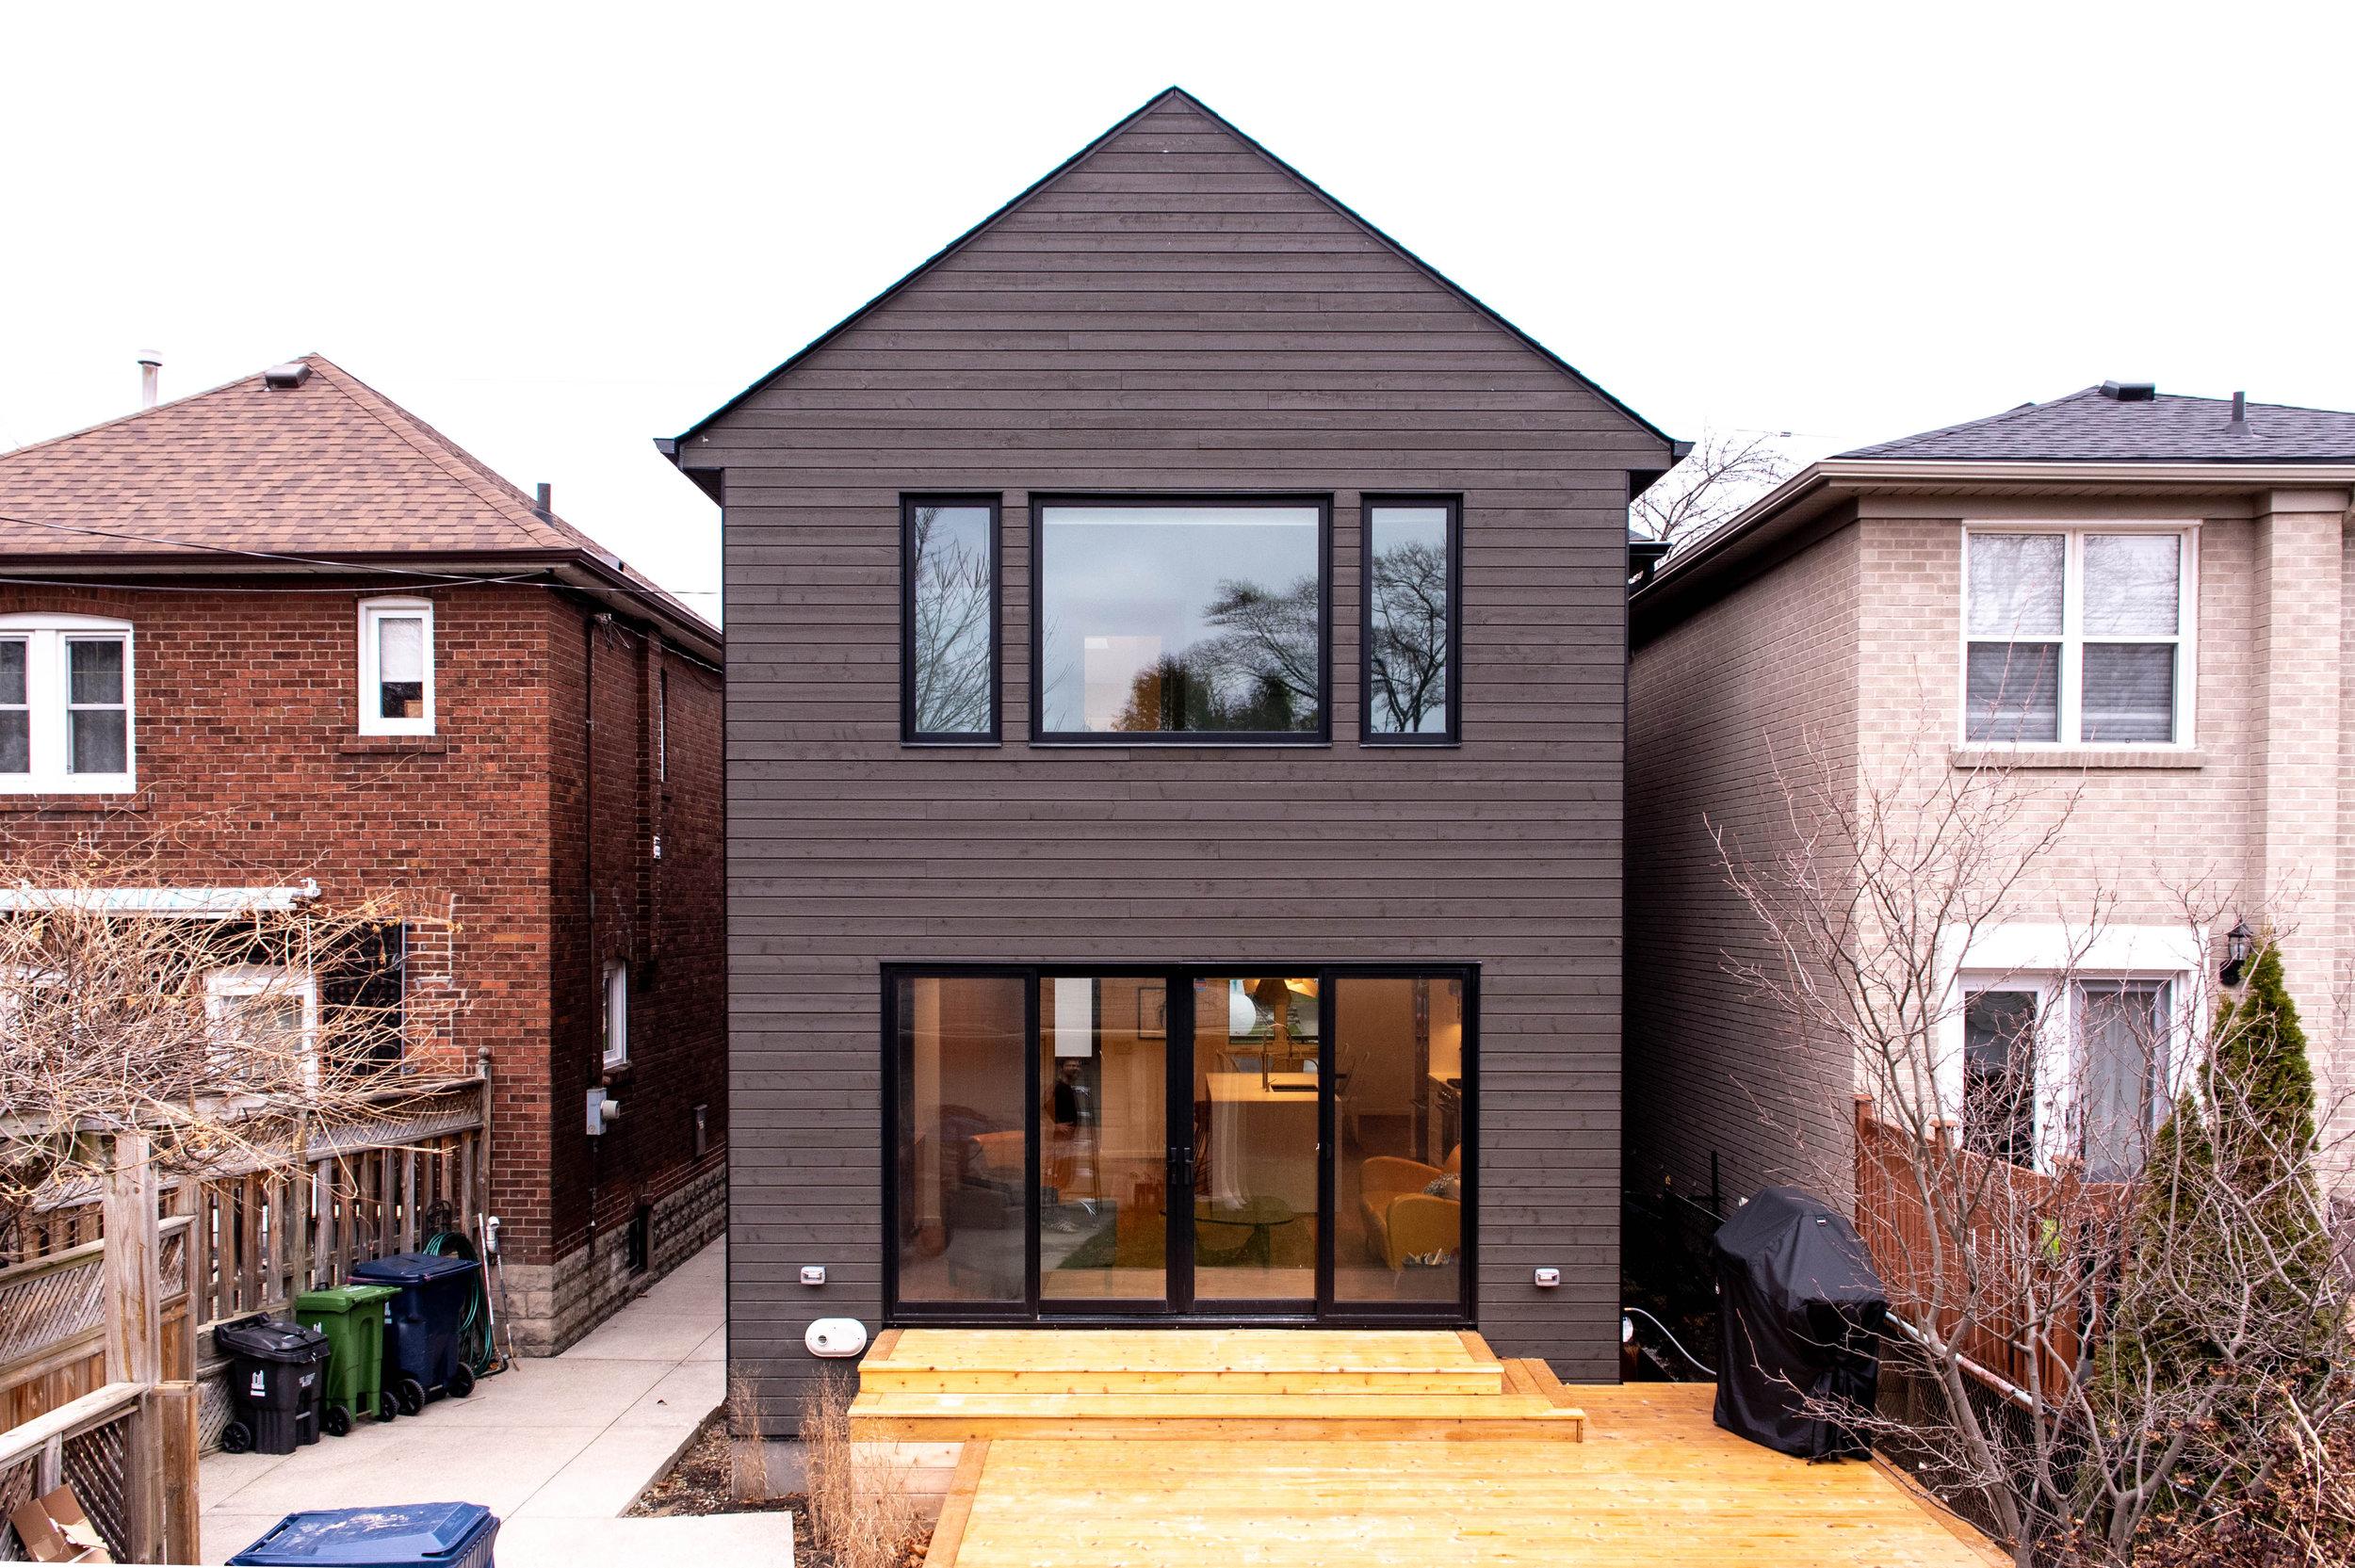 Ninth Street Home A Modern Rear Addition in Etobicoke